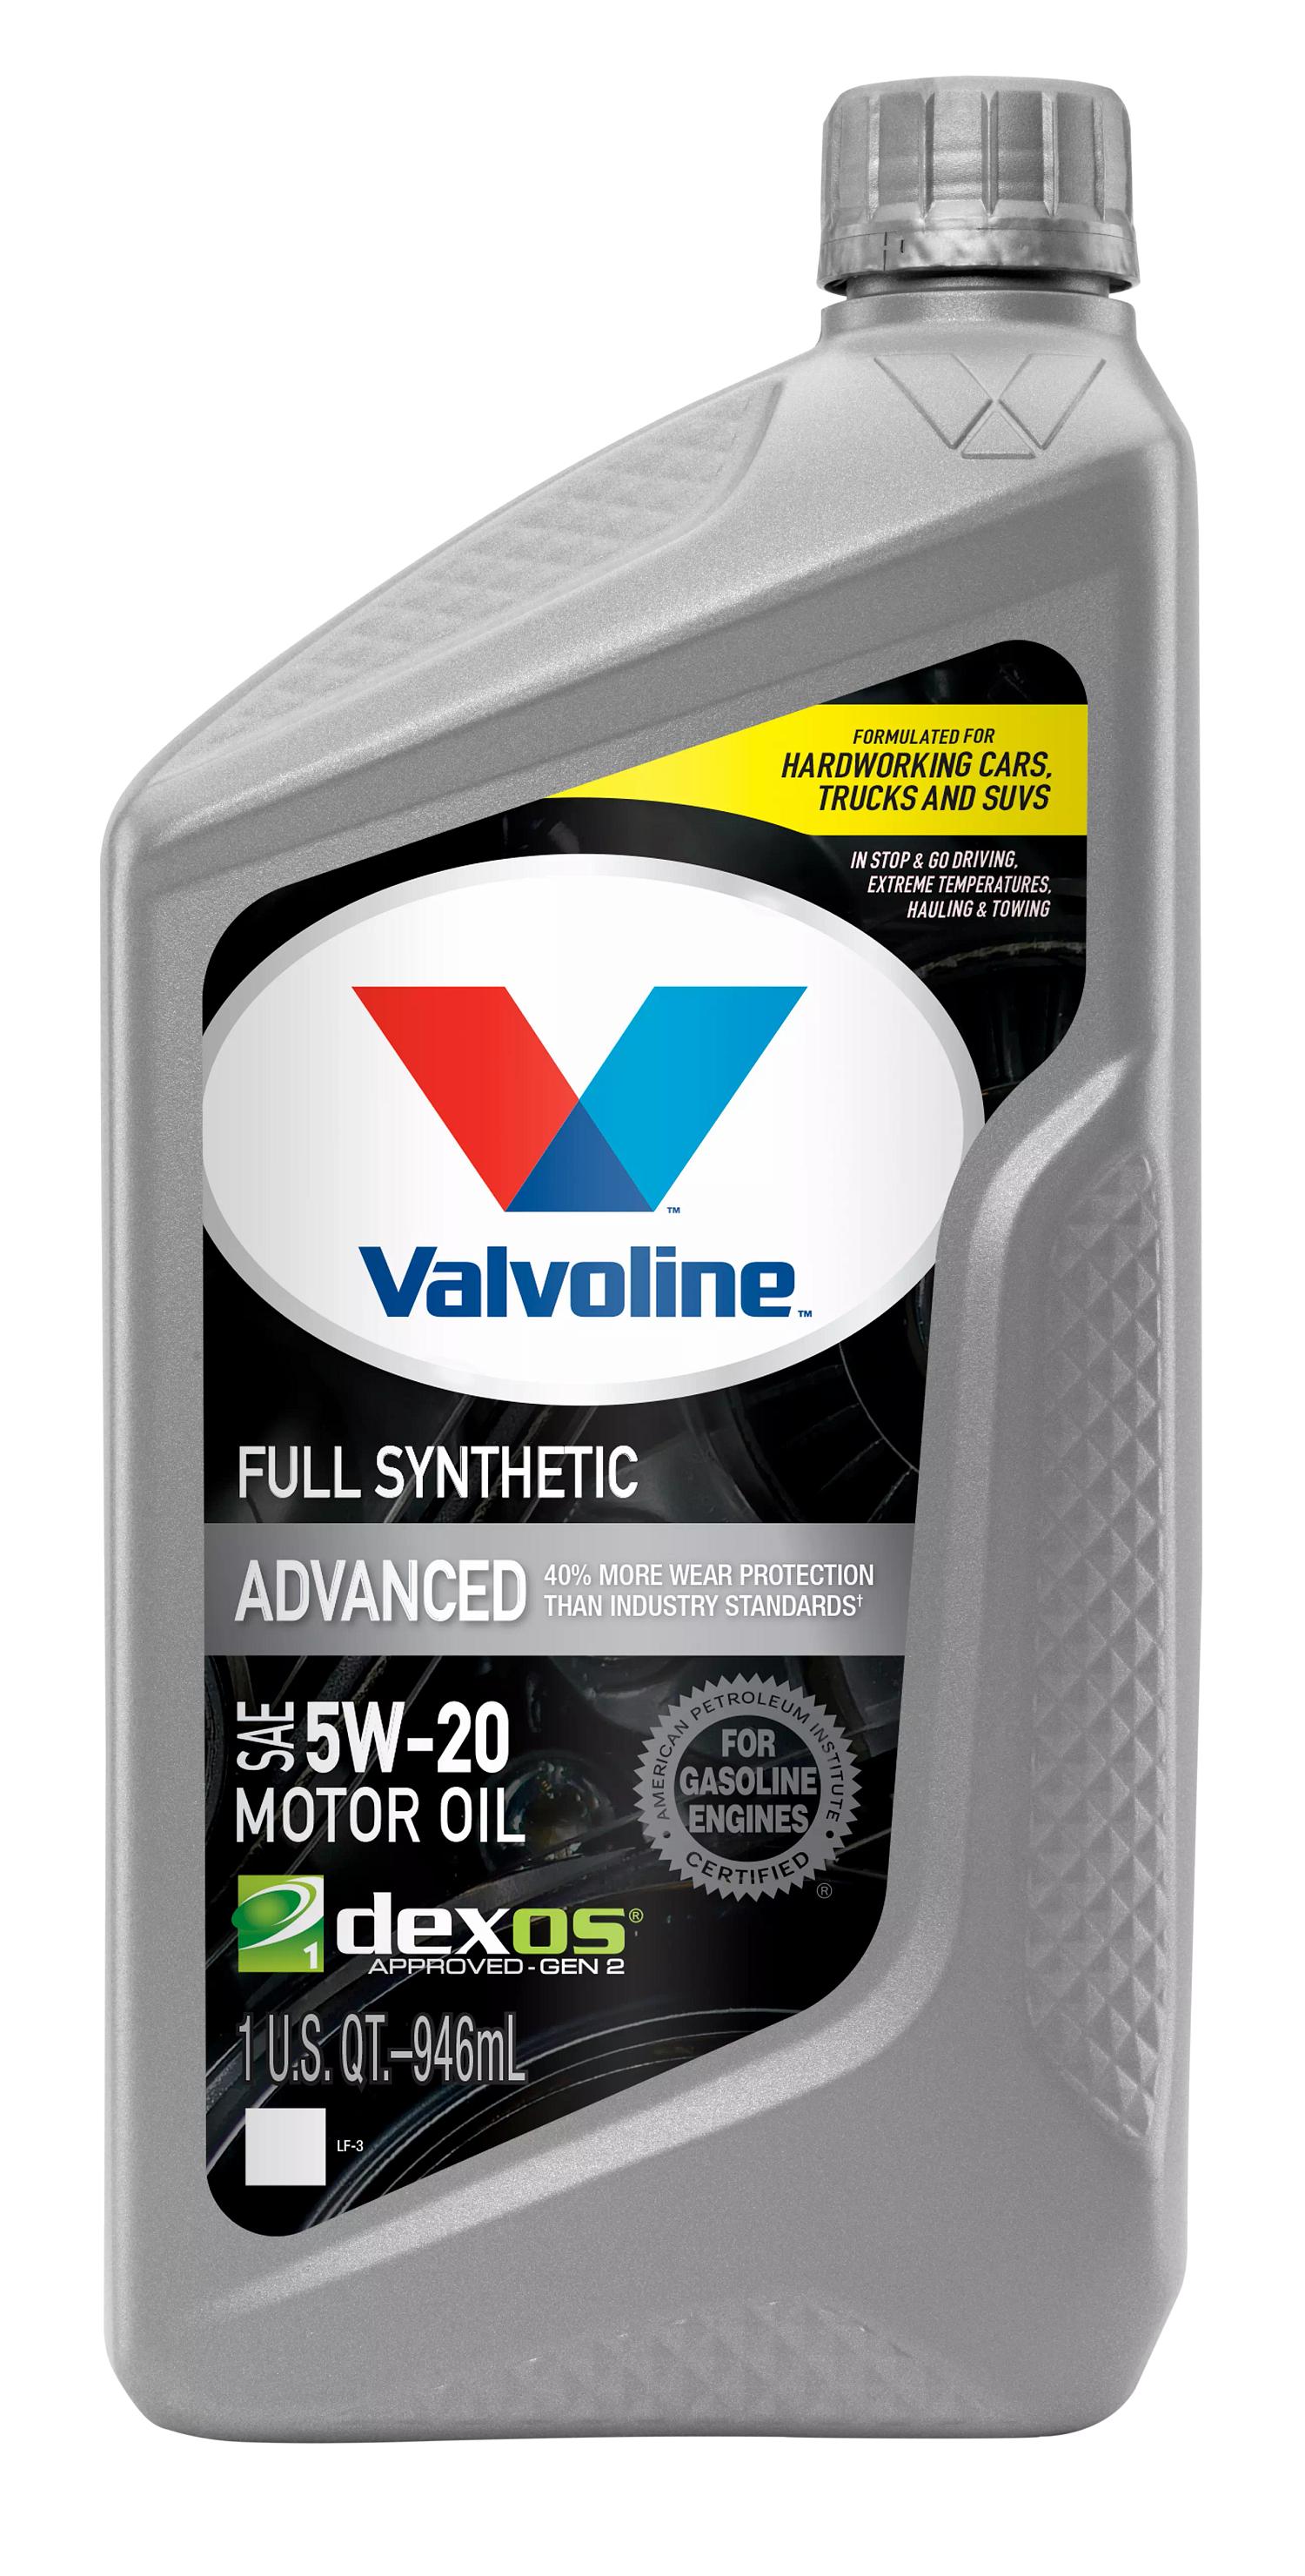 Valvoline先进的全合成SAE 5W-20电机油